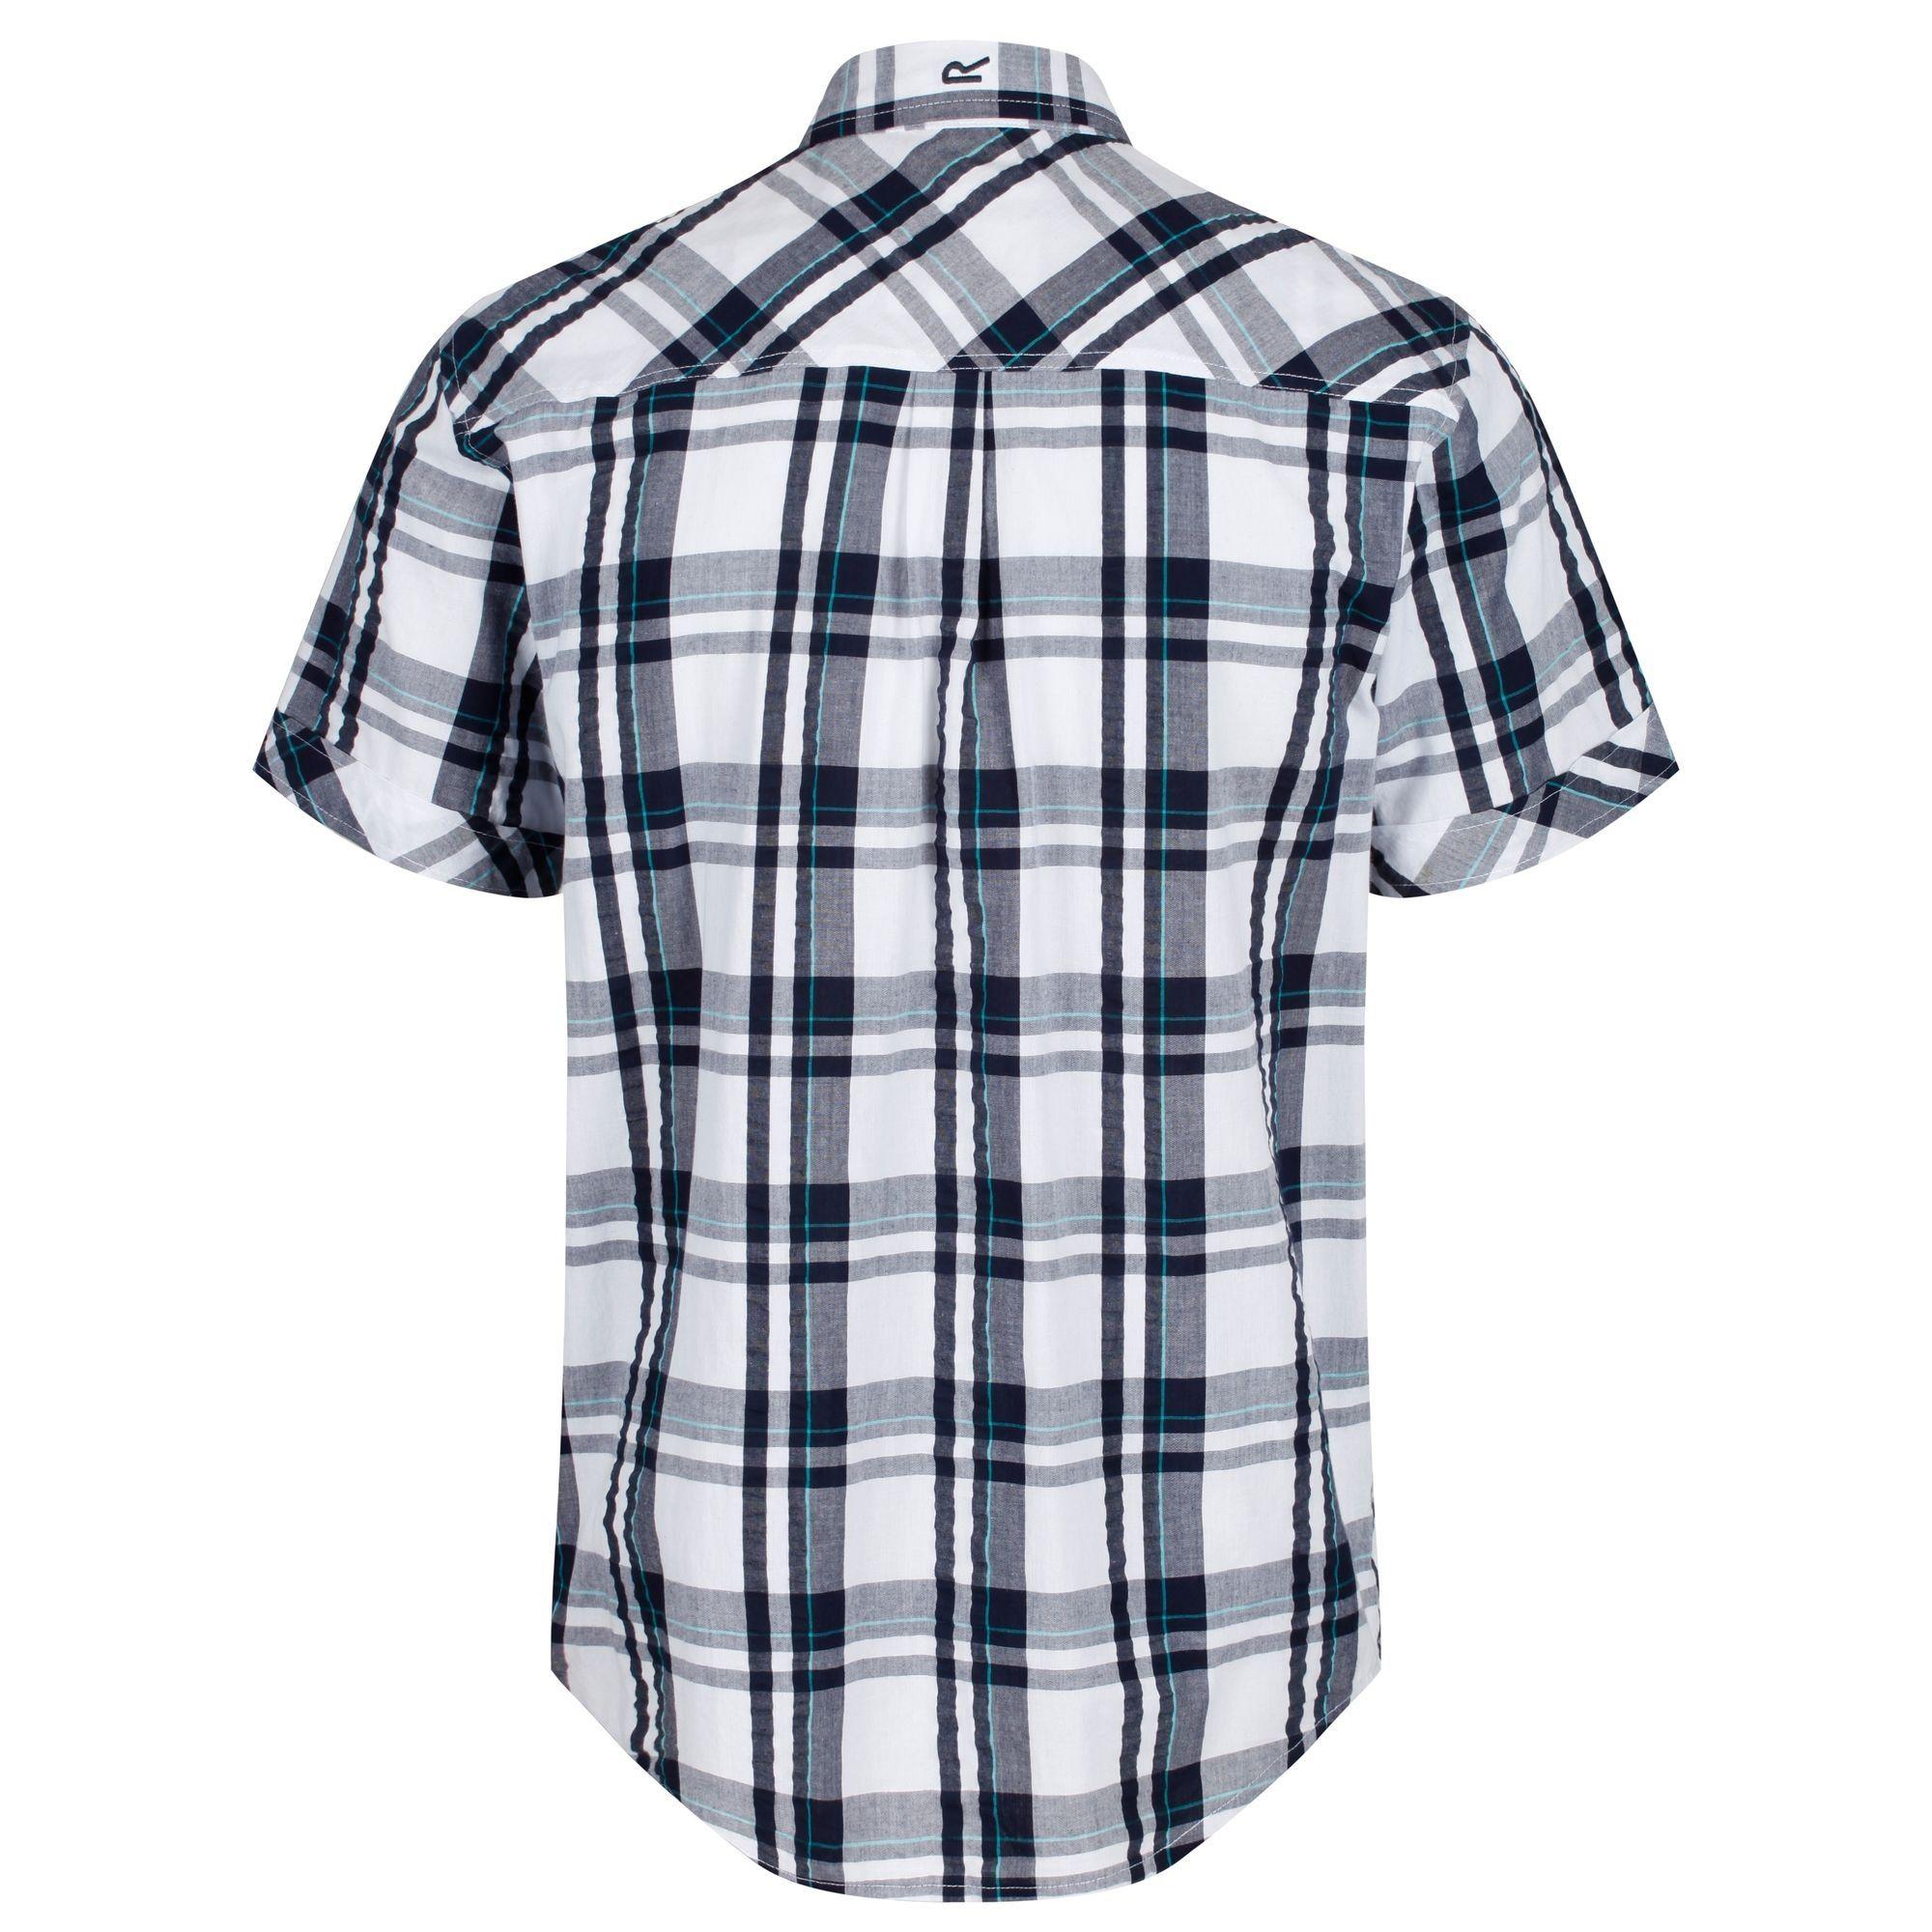 Regatta Mens Deakin III Short Sleeve Checked Shirt